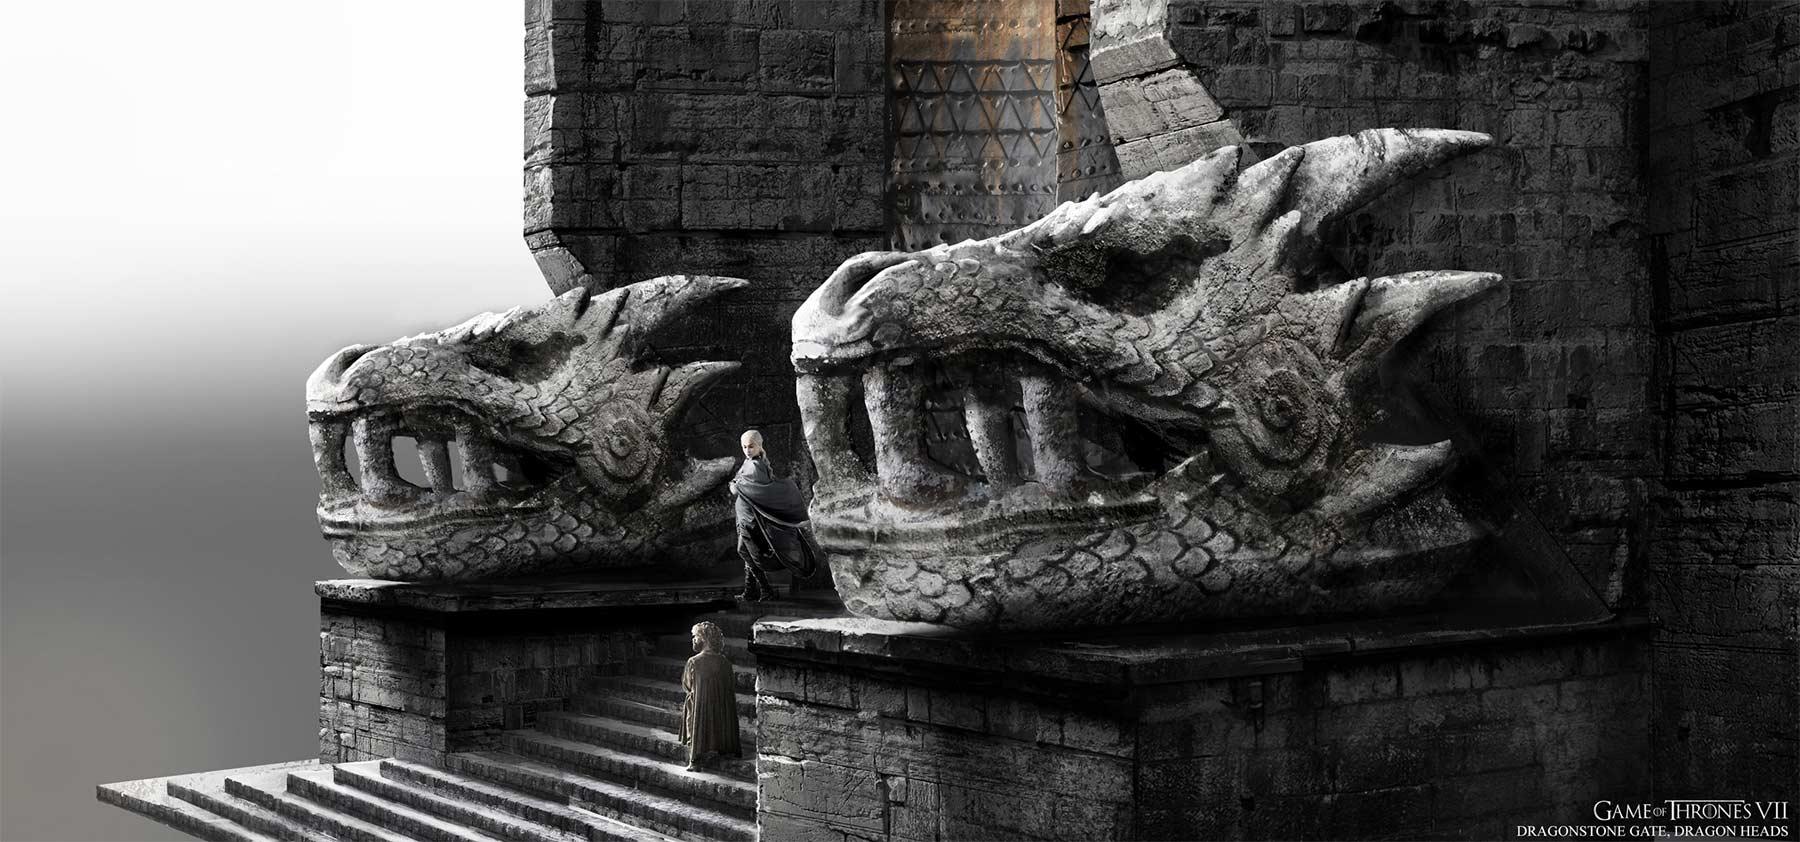 Game of Thrones Staffel 7 Concept Art Kieran-Belshaw-game-of-thrones-concept-art_04